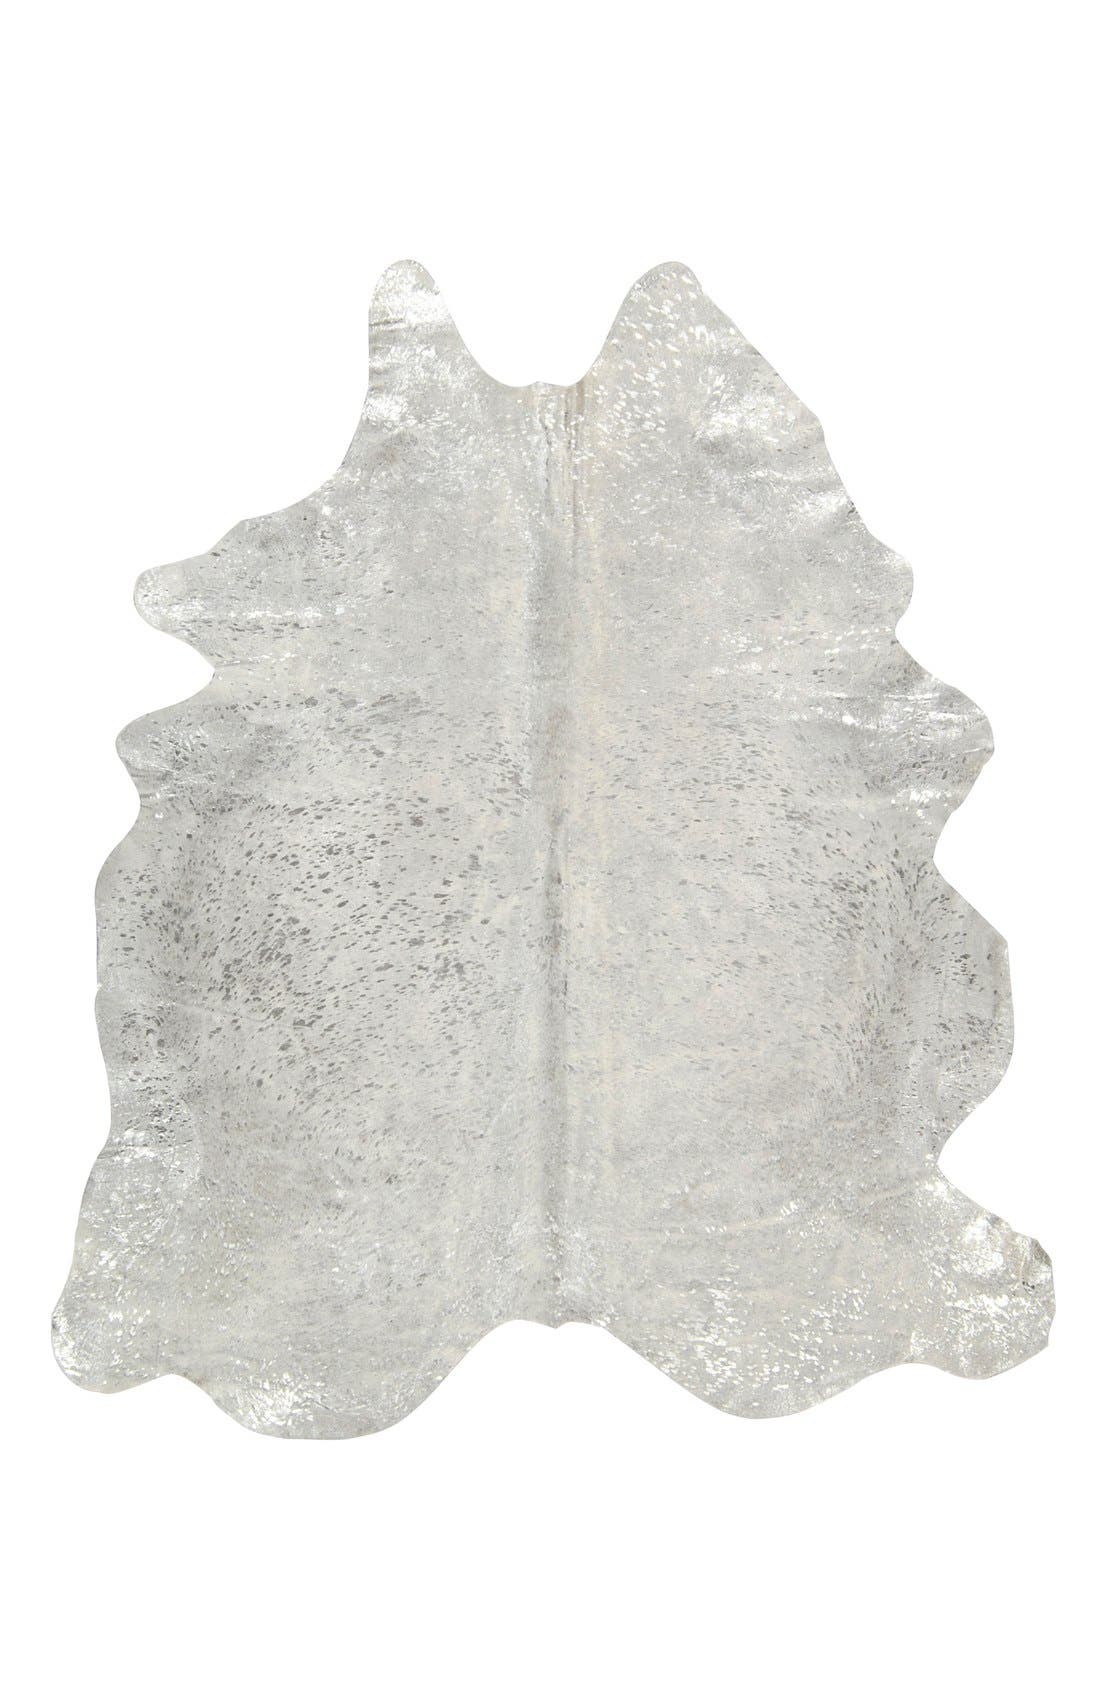 'Metallic Splash' Genuine Cowhide Rug,                             Main thumbnail 1, color,                             SILVER